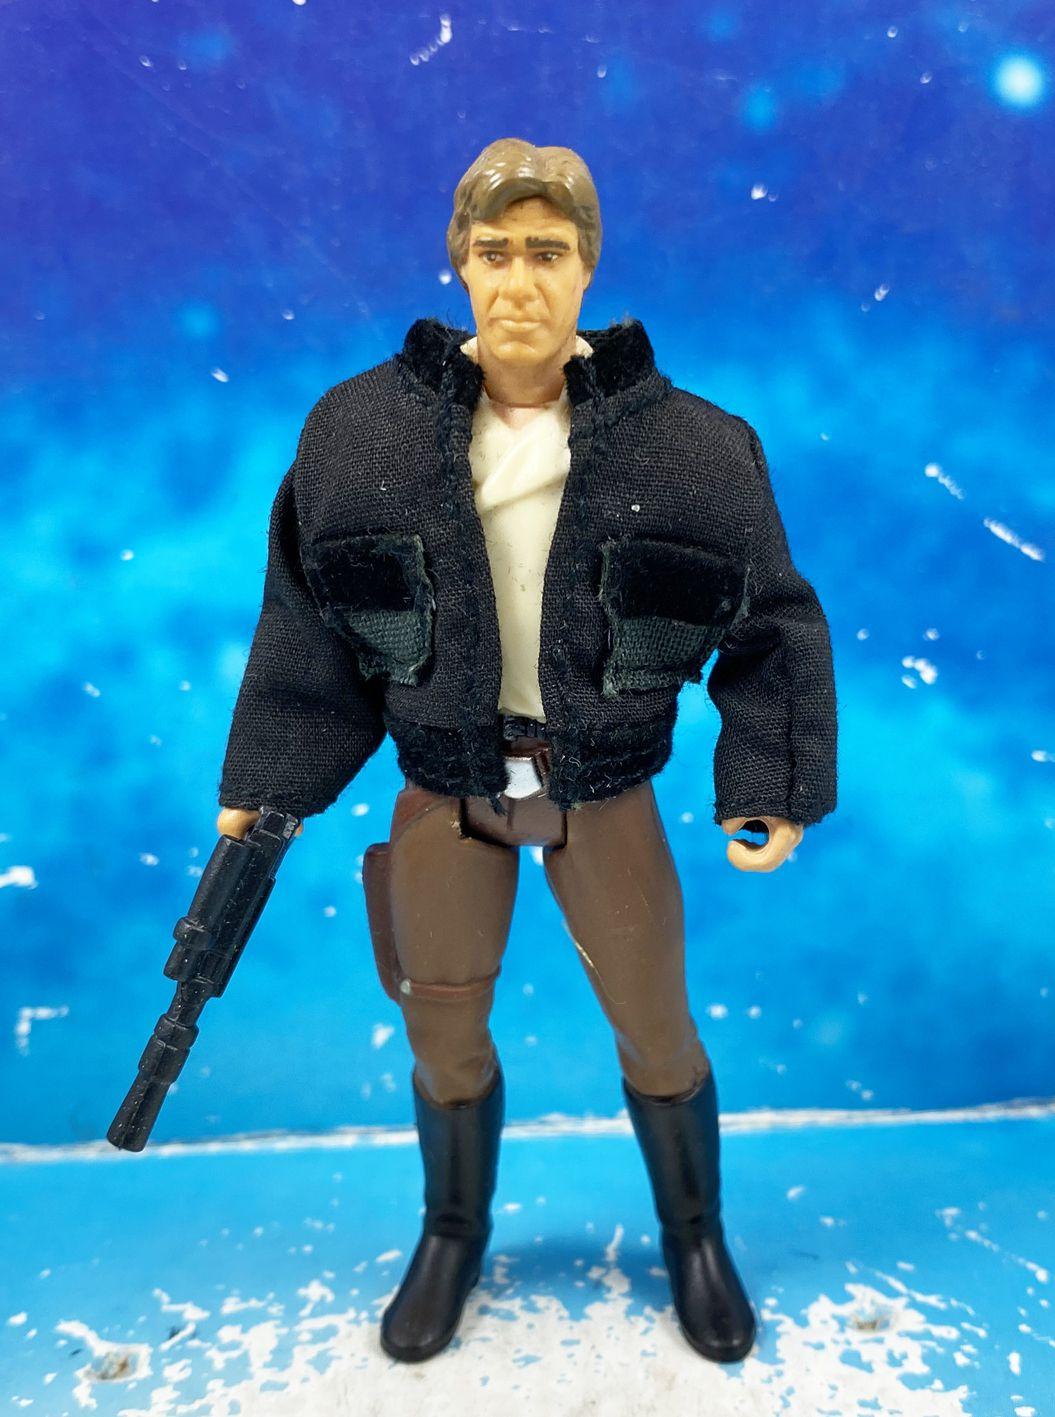 Star Wars (Loose) - Kenner/Hasbro - Han Solo (Bespin Gear) Princess Leia Collection